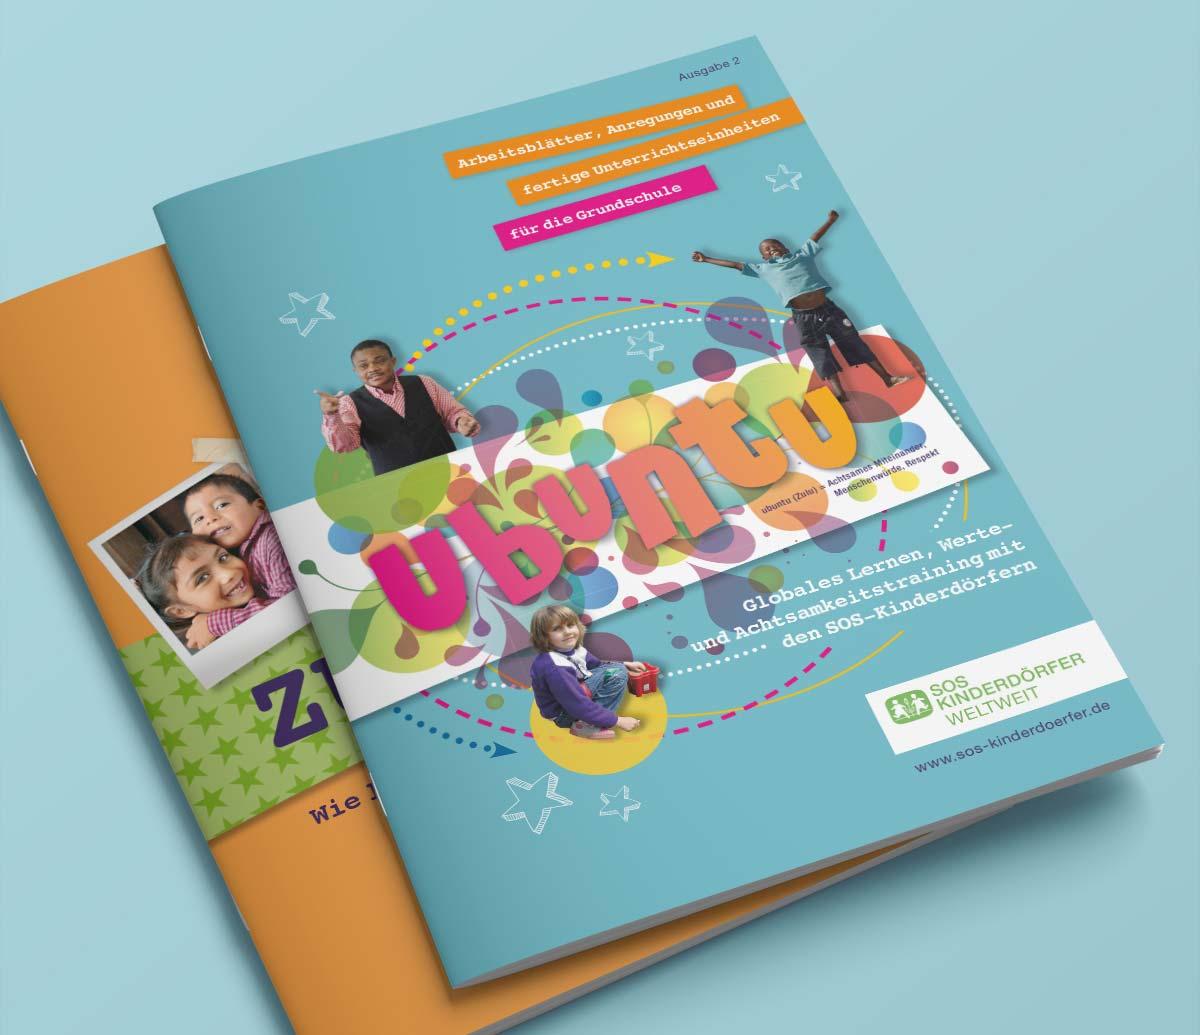 Verschiedene Hefte von SOS Kinderdörfer | c-c-design.de